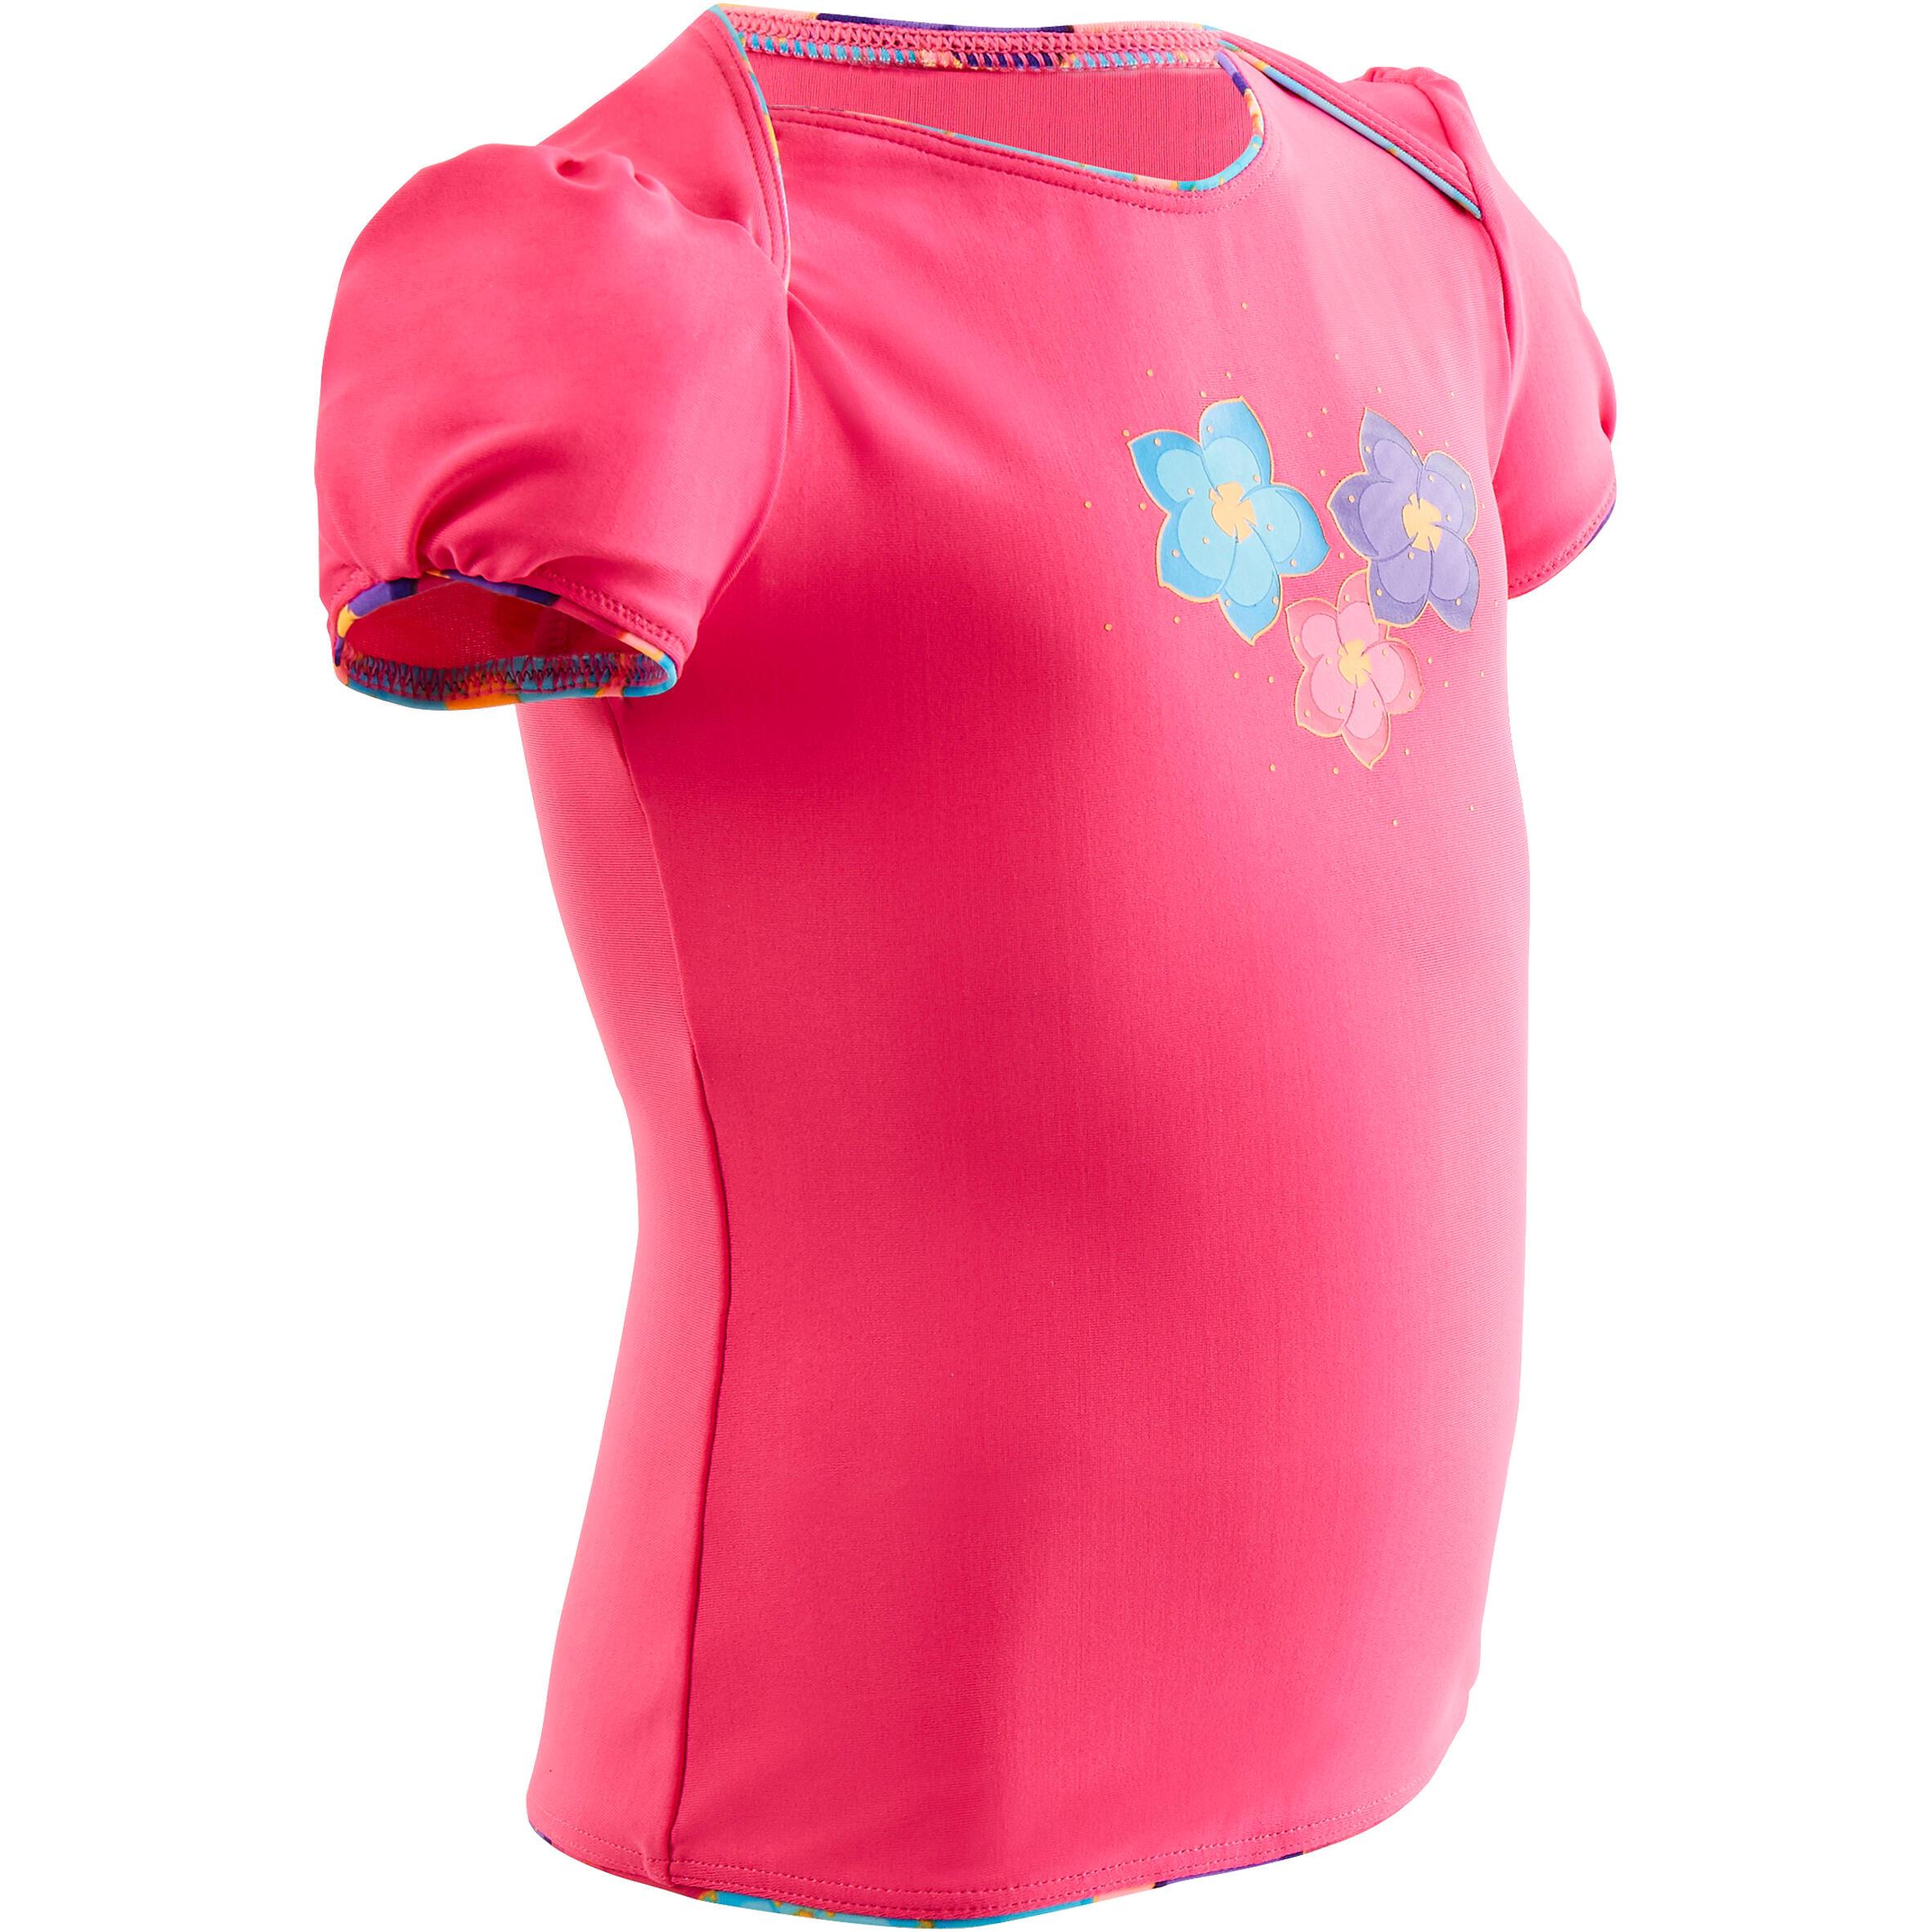 Baby,Kinder,Mädchen,Kinder Bikini-Oberteil Tankini Top Tia Baby Mädchen Print Blumen rosa   03583788142652